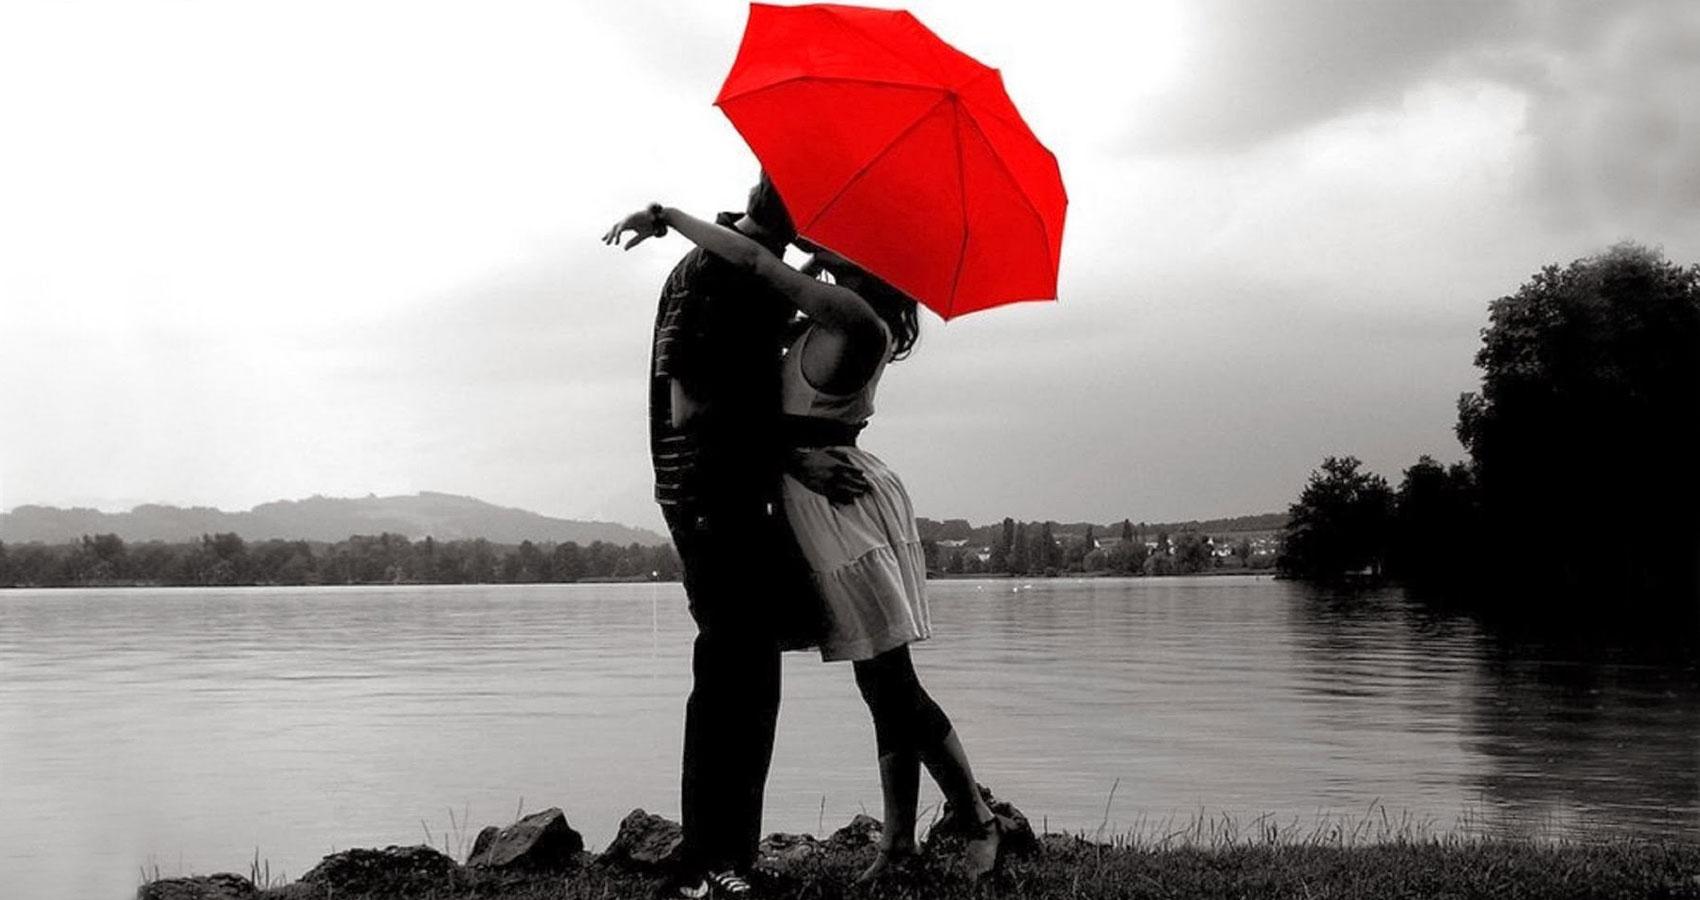 Estar Enamorado by José A Gómezat Spillwords.com